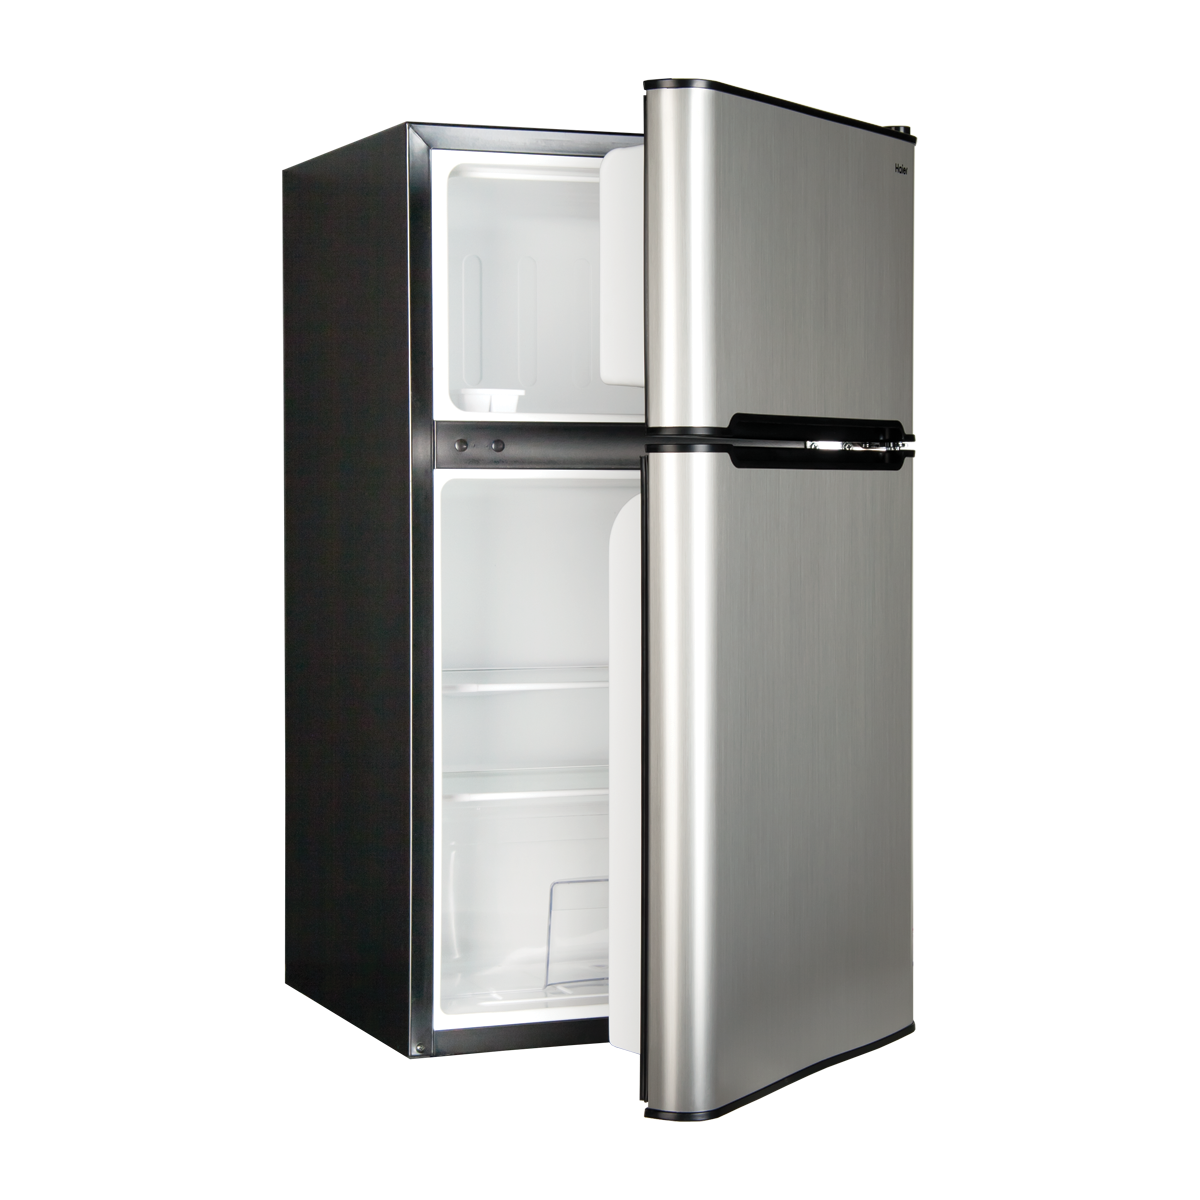 Refrigerator clipart refridgerator. Png transparent images pluspng